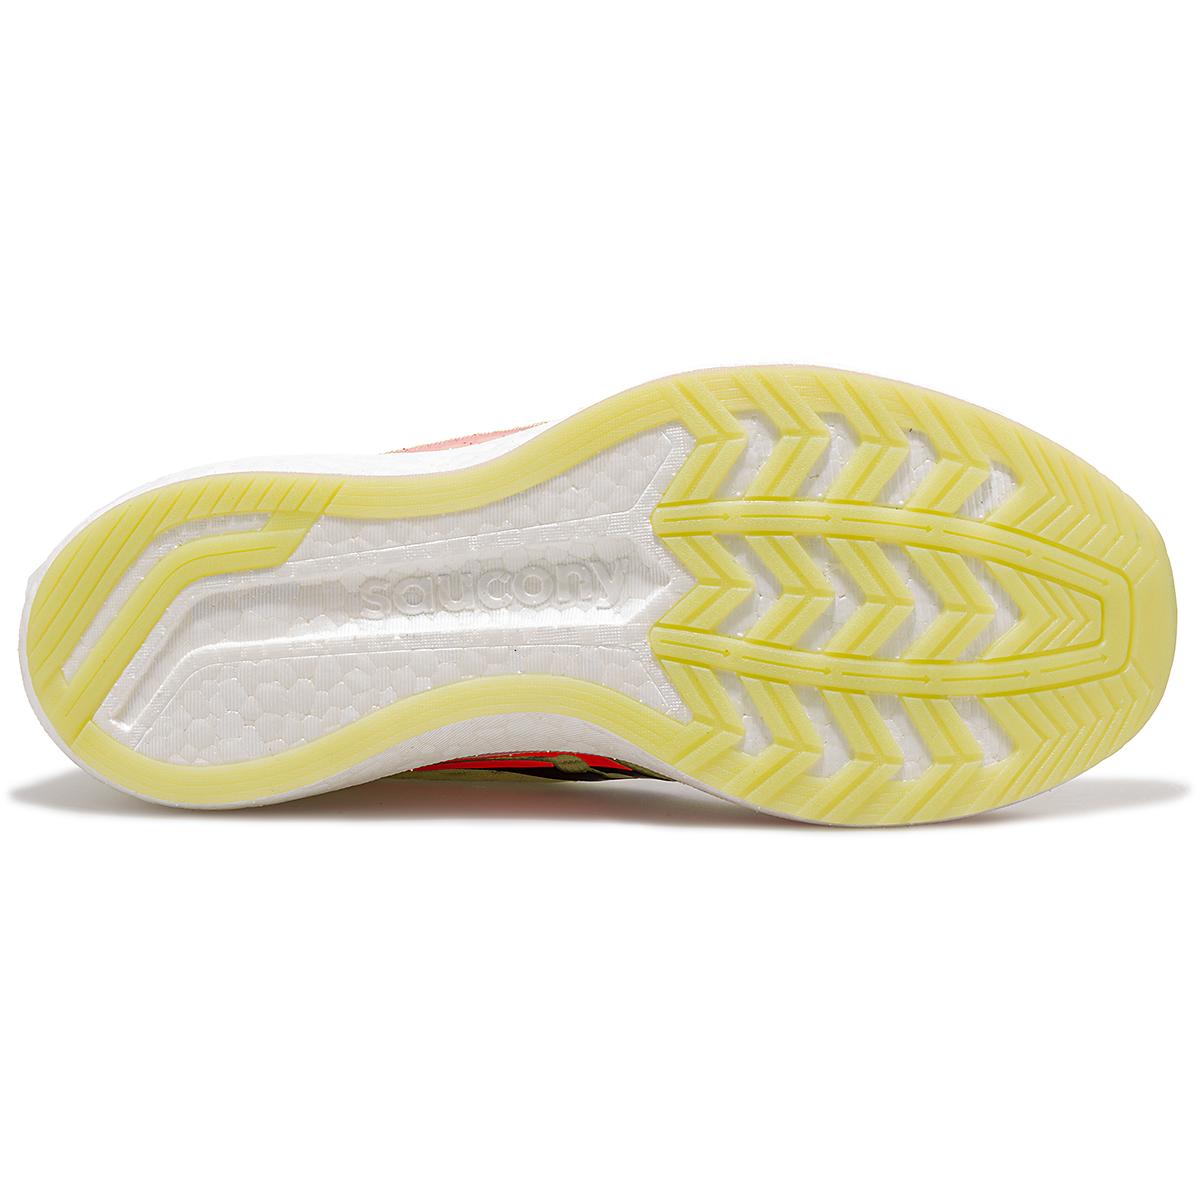 Women's Saucony Jackalope 2.0 Endorphin Speed Running Shoe - Color: Jackalope - Size: 5 - Width: Regular, Jackalope, large, image 3